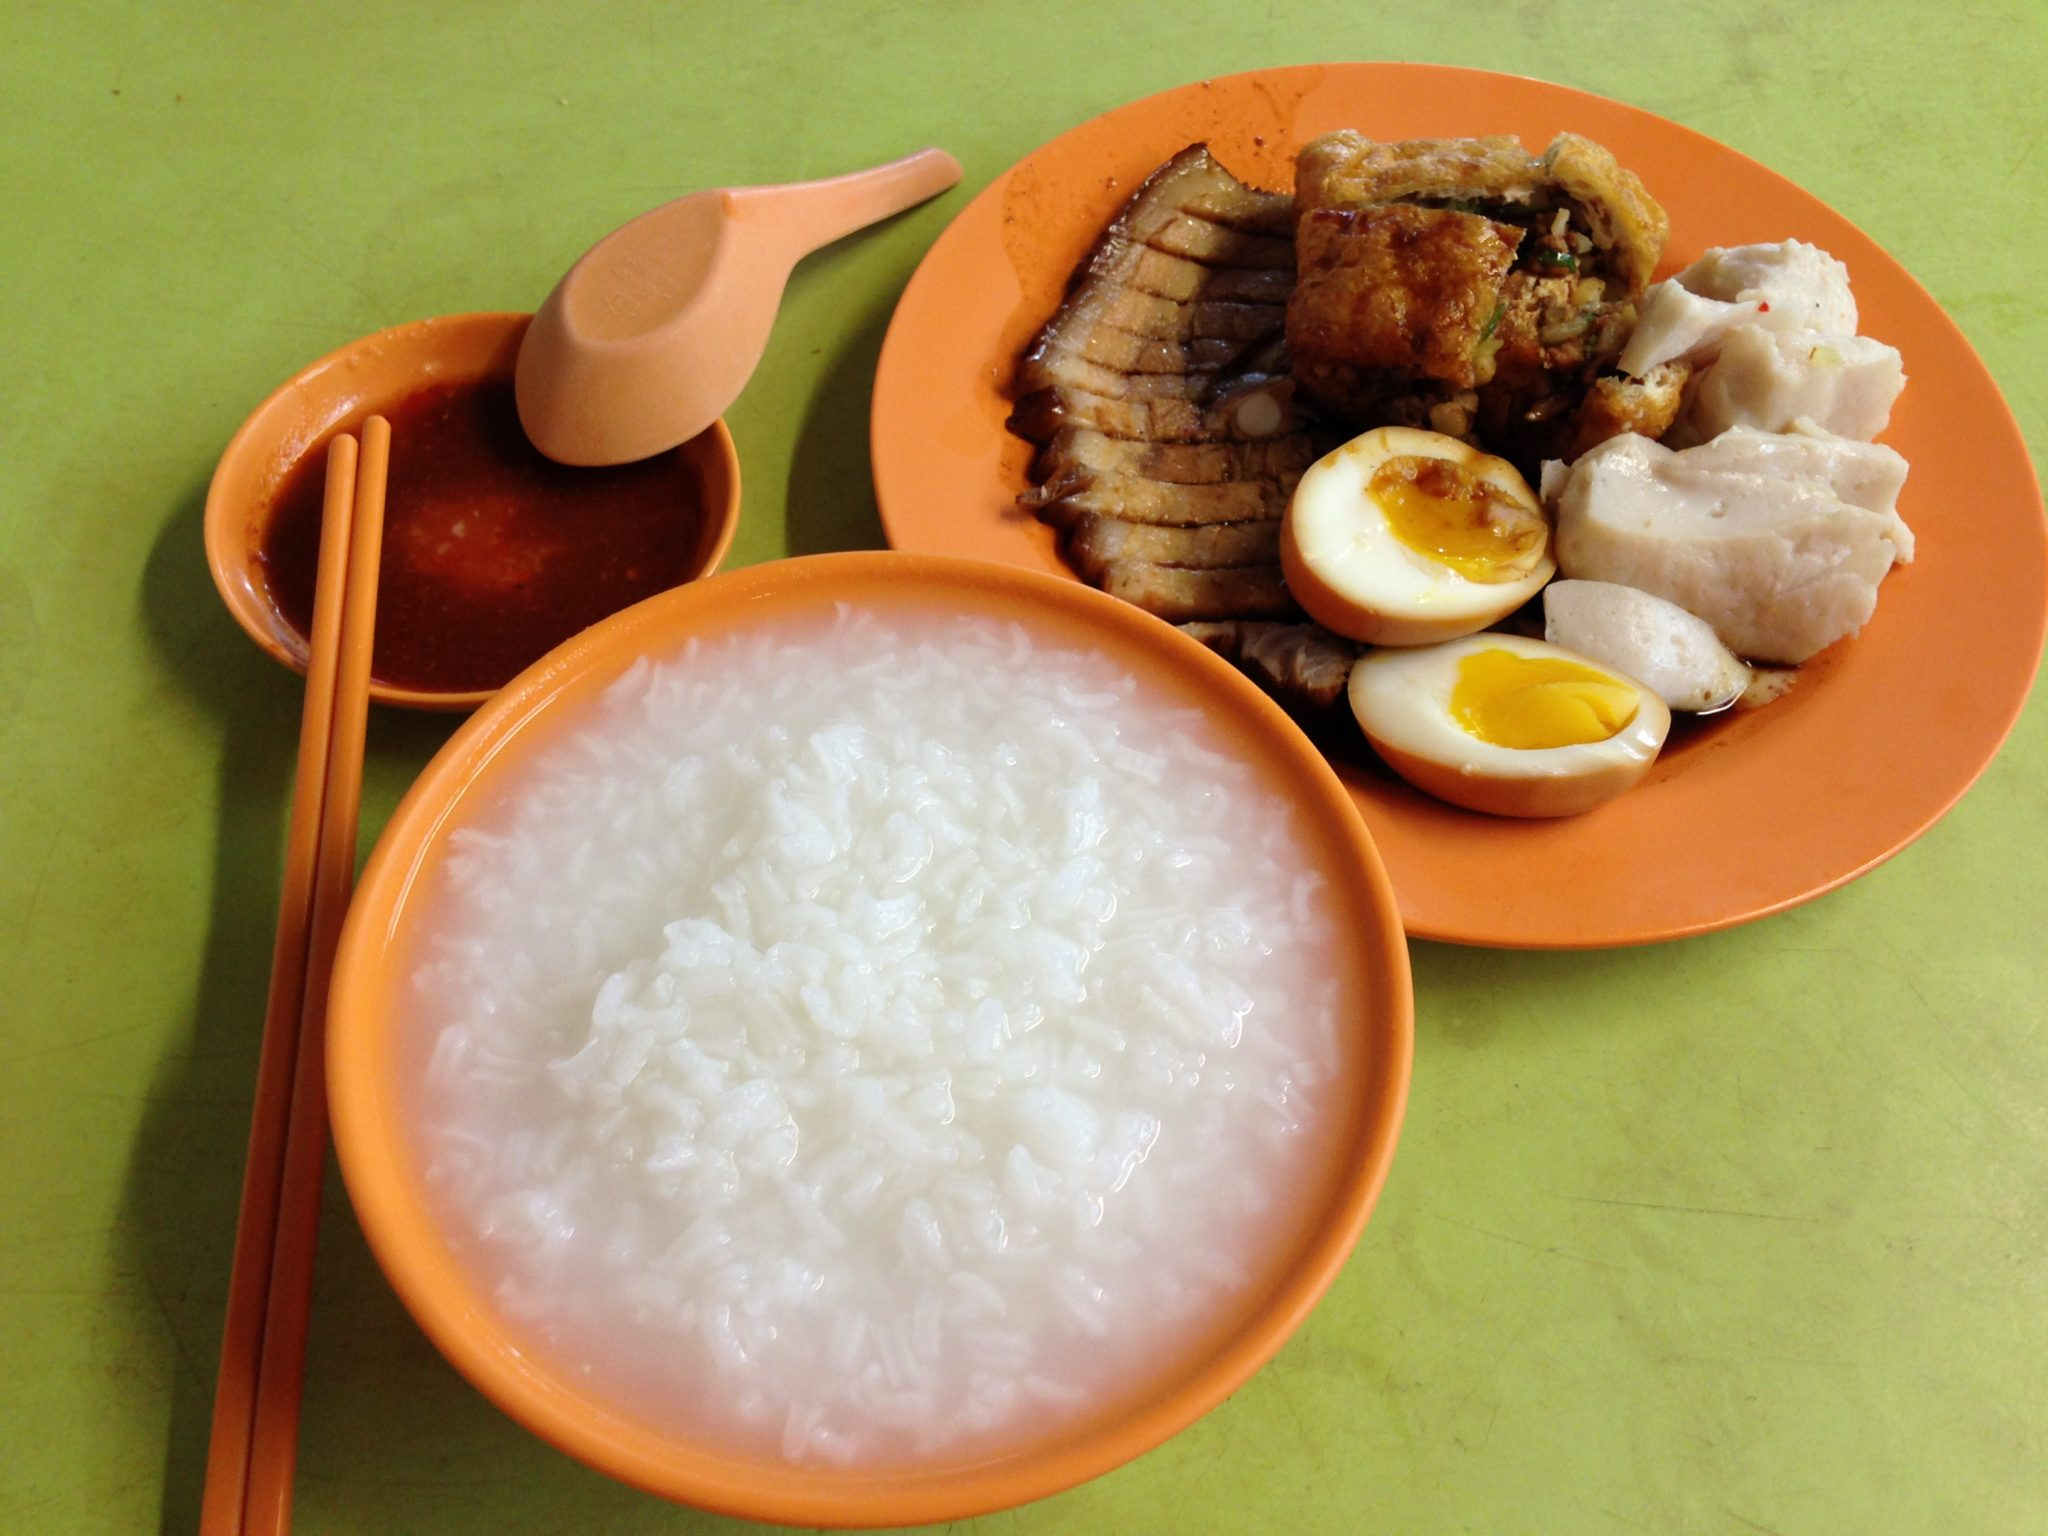 teochew porridge teochew muay rice chili braised side dish salted egg roast meat singapore malaysia traditional streeet hawker food